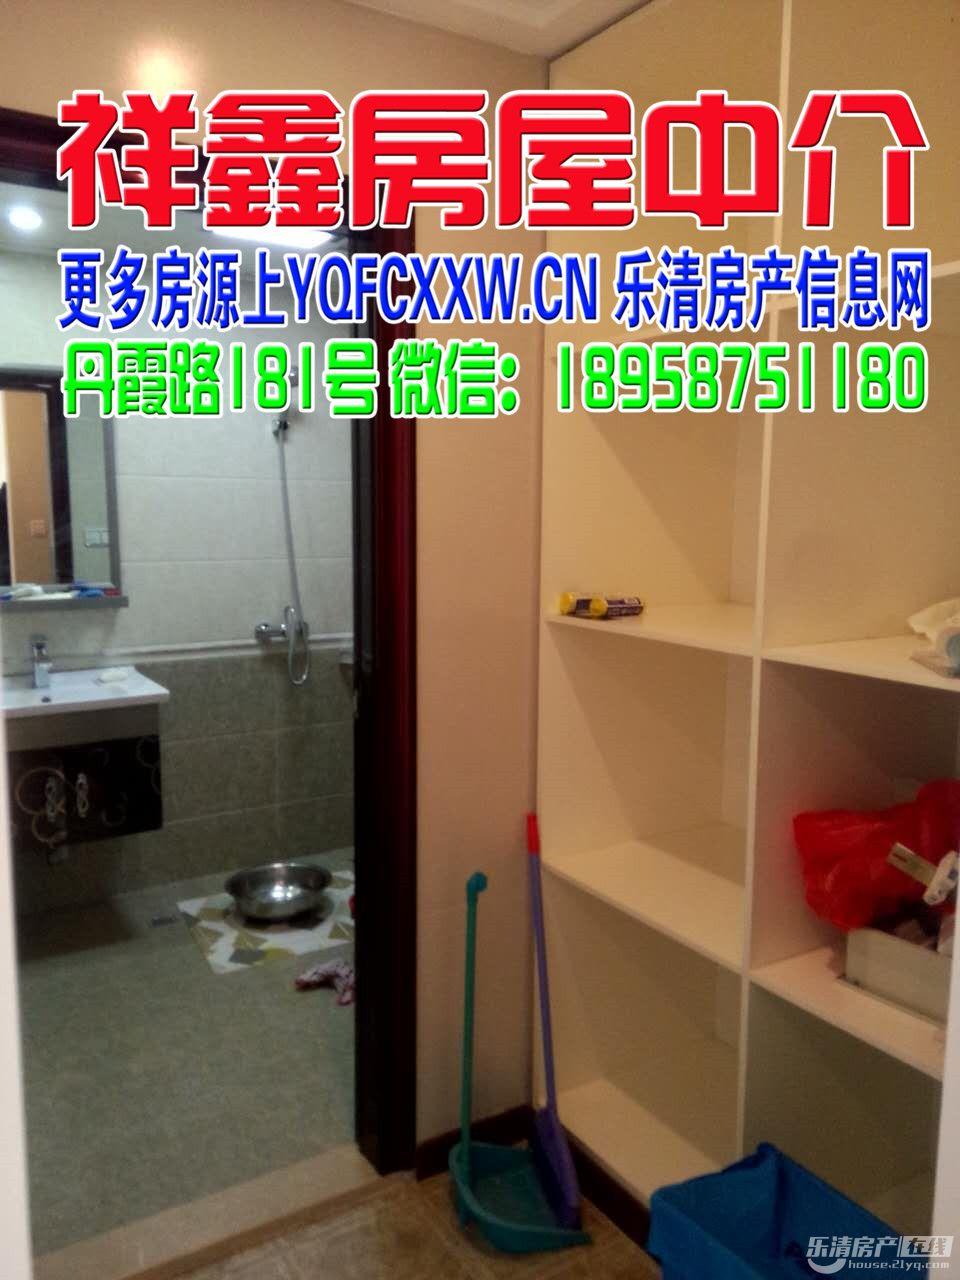 http://house.21yq.com/userfiles/image/20160630/30141149bbfa54b6762122.jpg